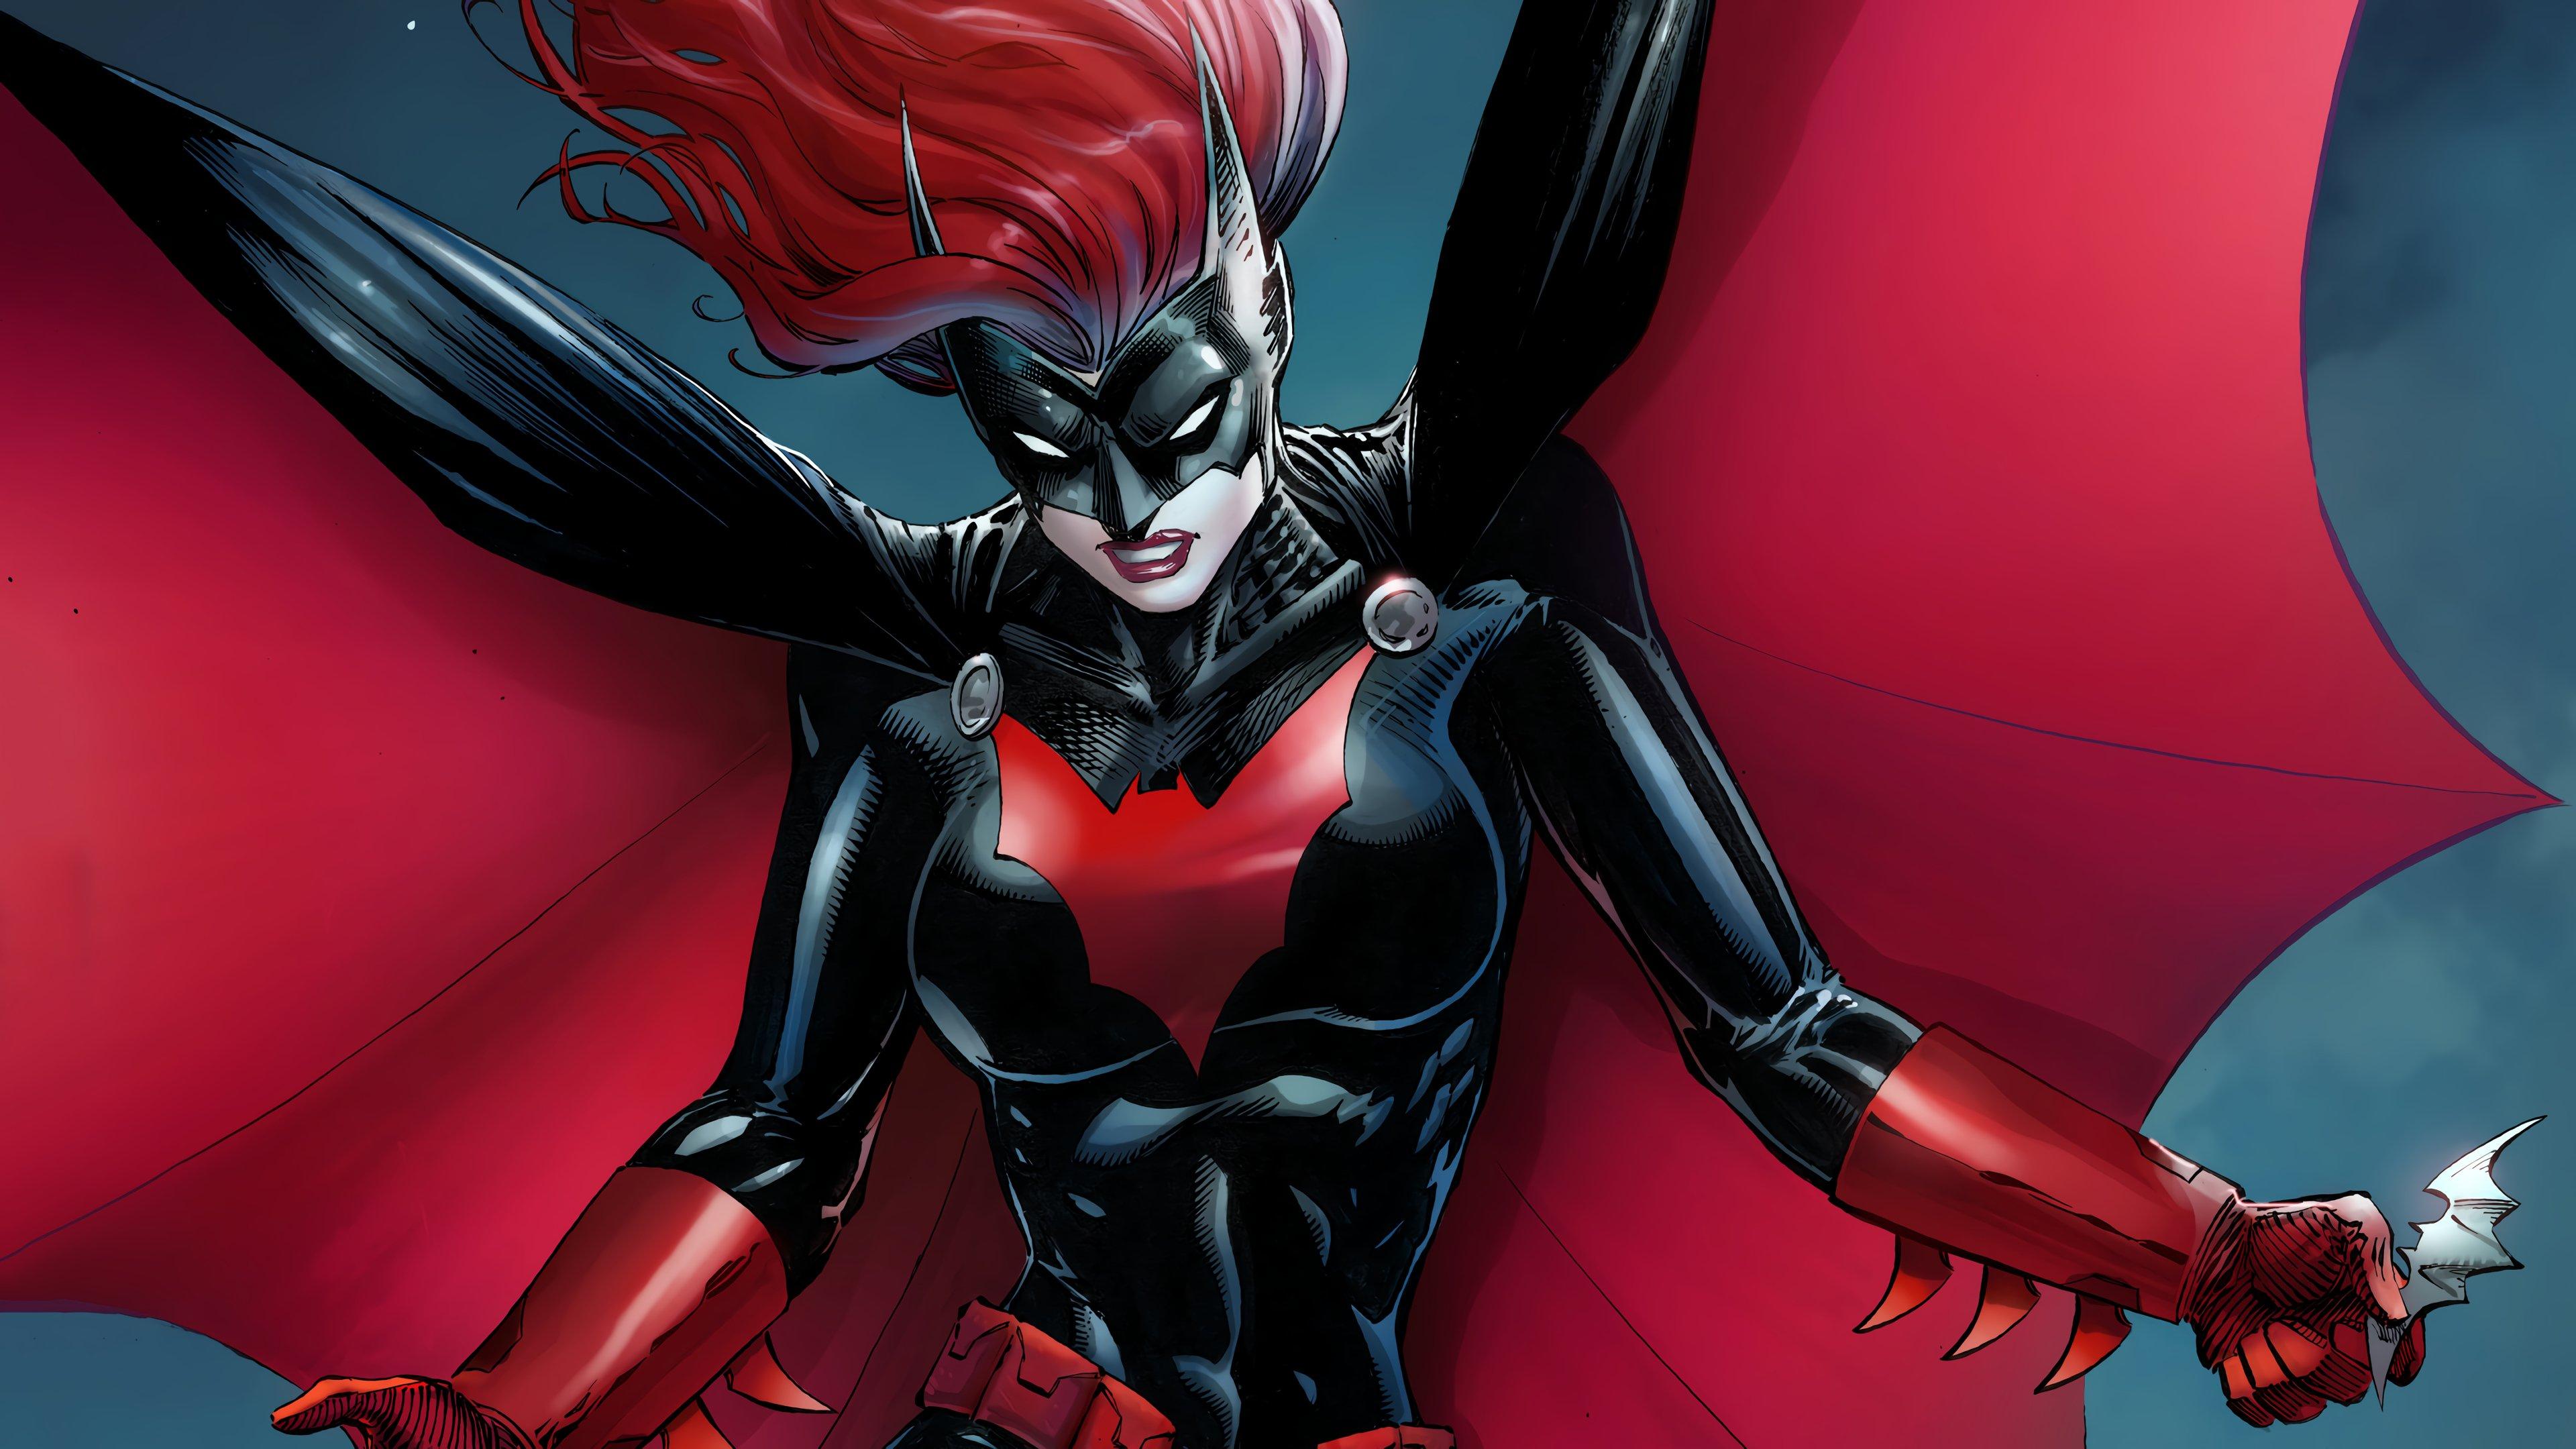 Fondos de pantalla Batwoman Fanart